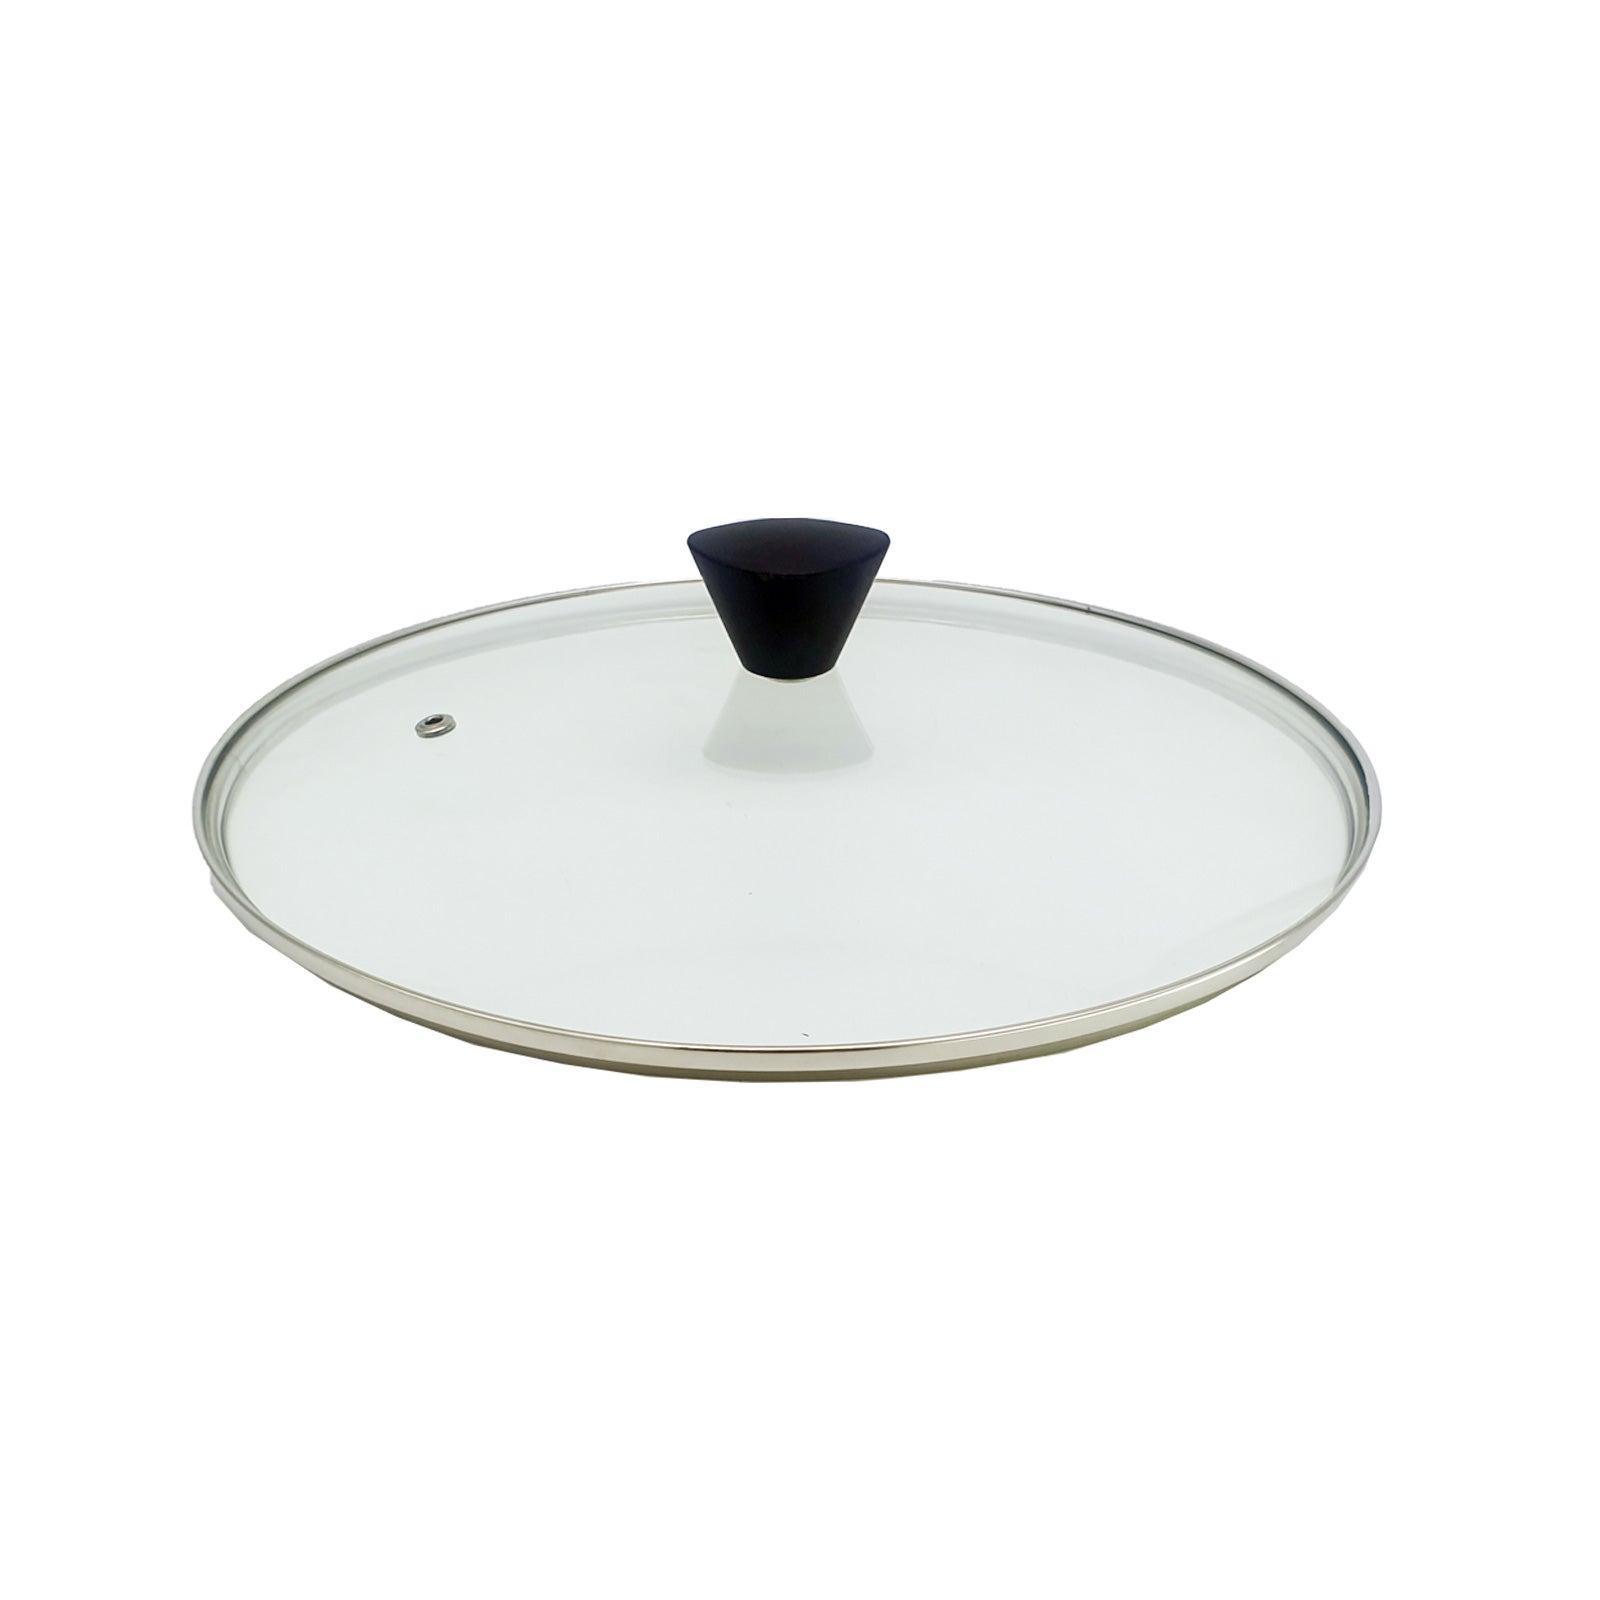 KOMAN Stainless Steel Glass Lid - 28cm